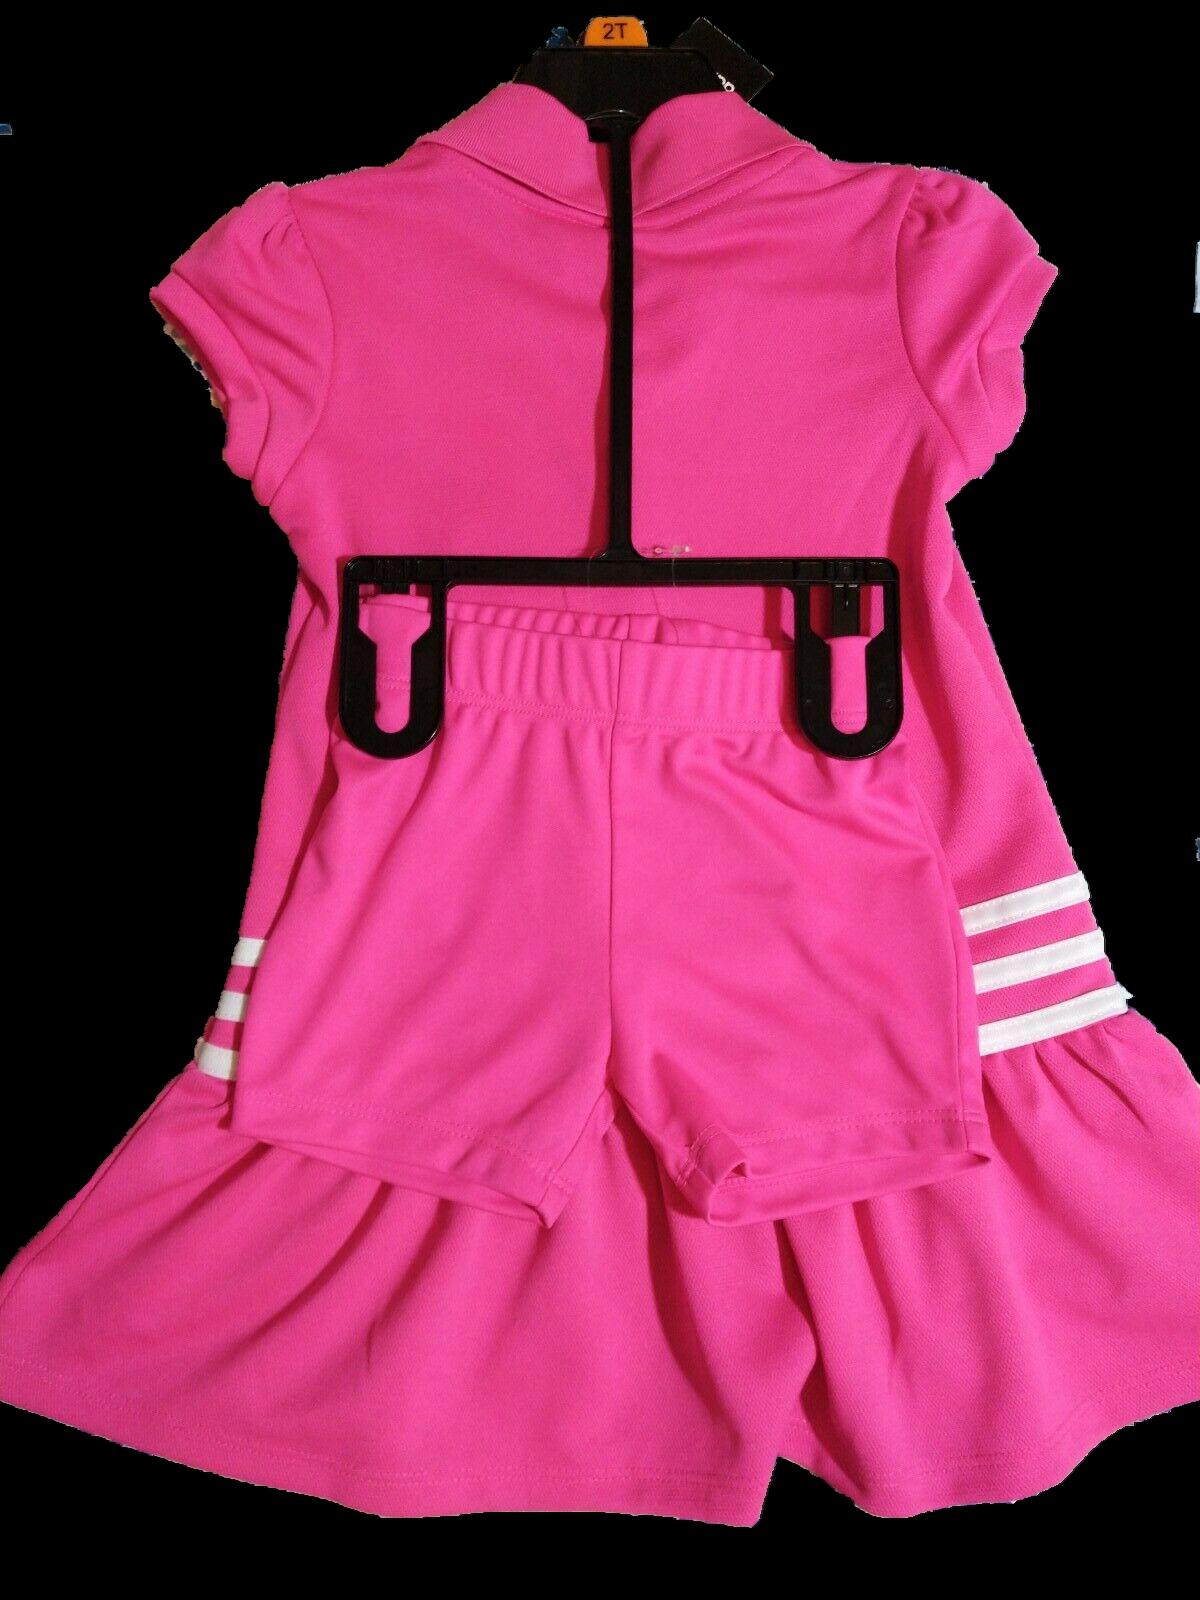 *Adidas Toddler Girls 2 Piece Ruffled Polo Shirt Bloomers Dress Set Pink 2T NWT*